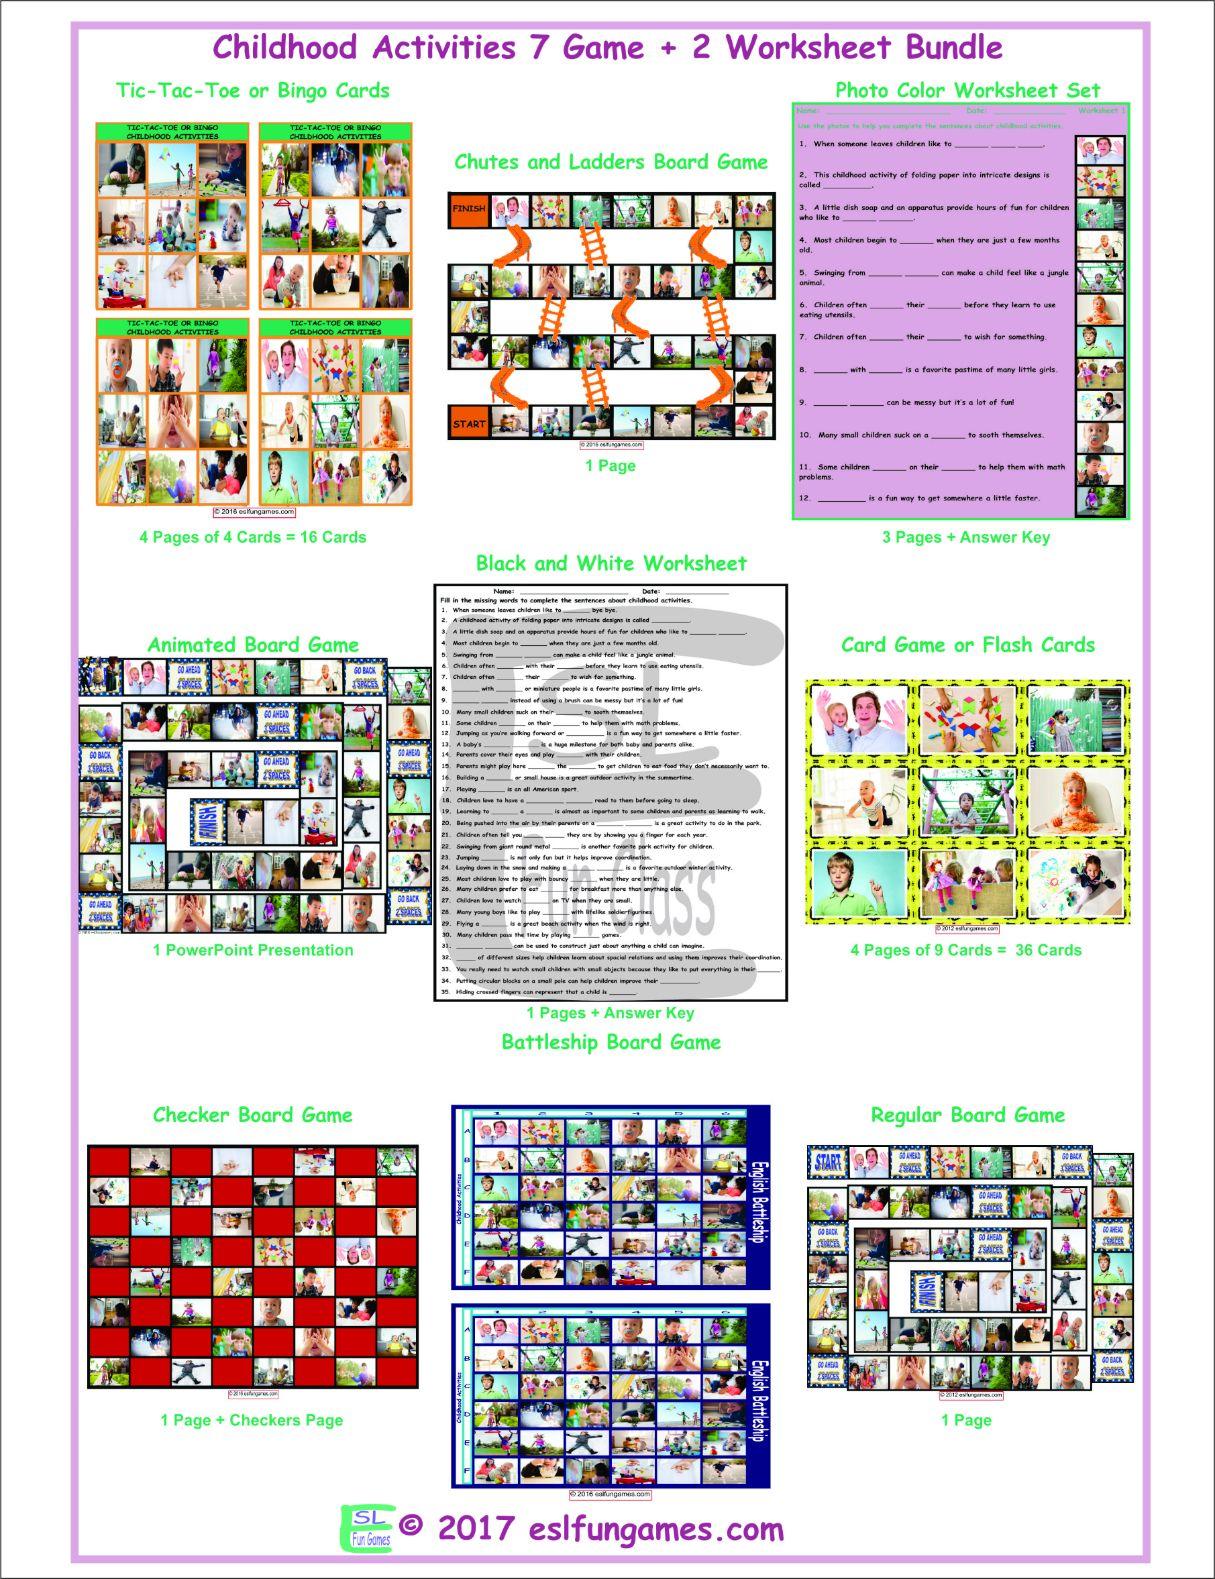 Childhood Activities 7 Game Plus 2 Worksheet Bundle